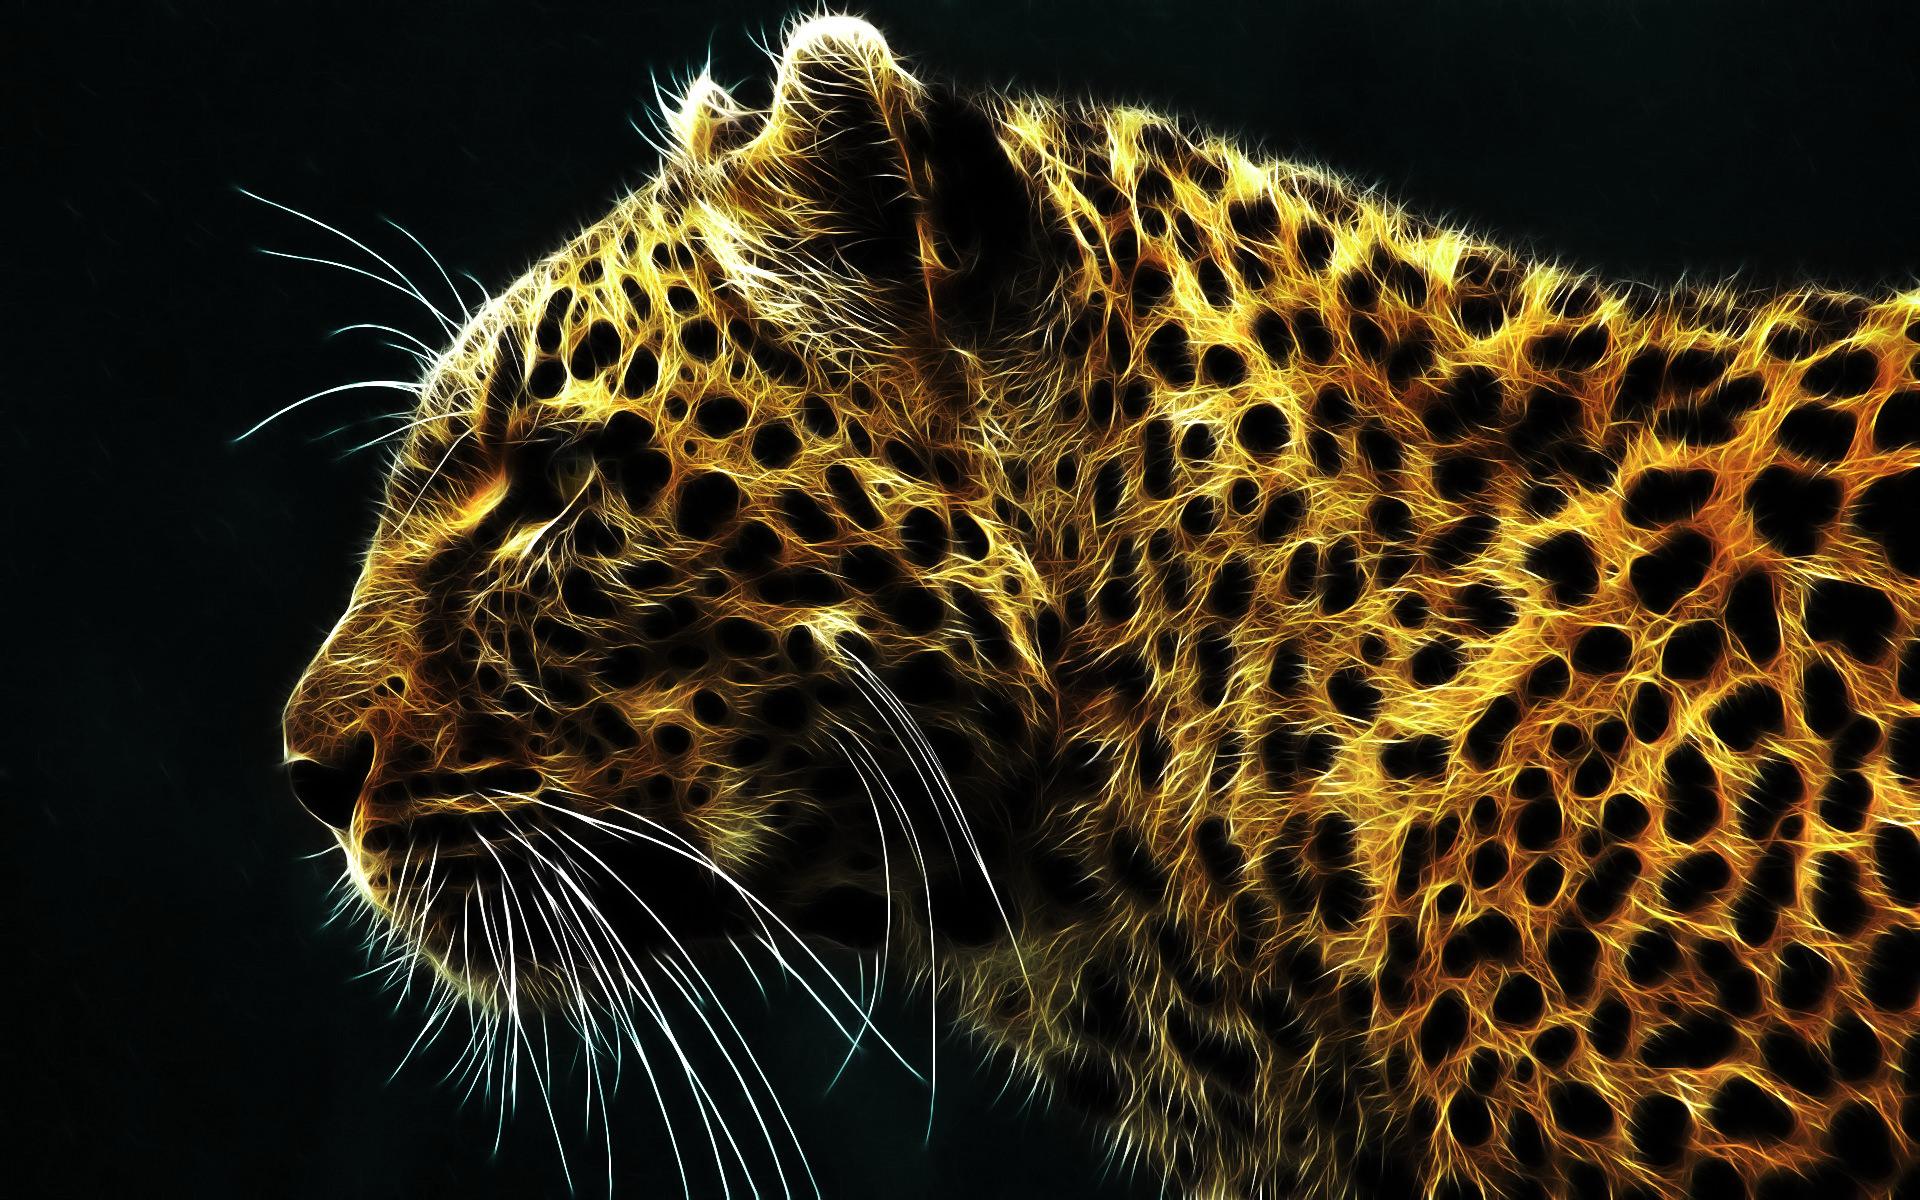 Awesome Cheetah Wallpaper